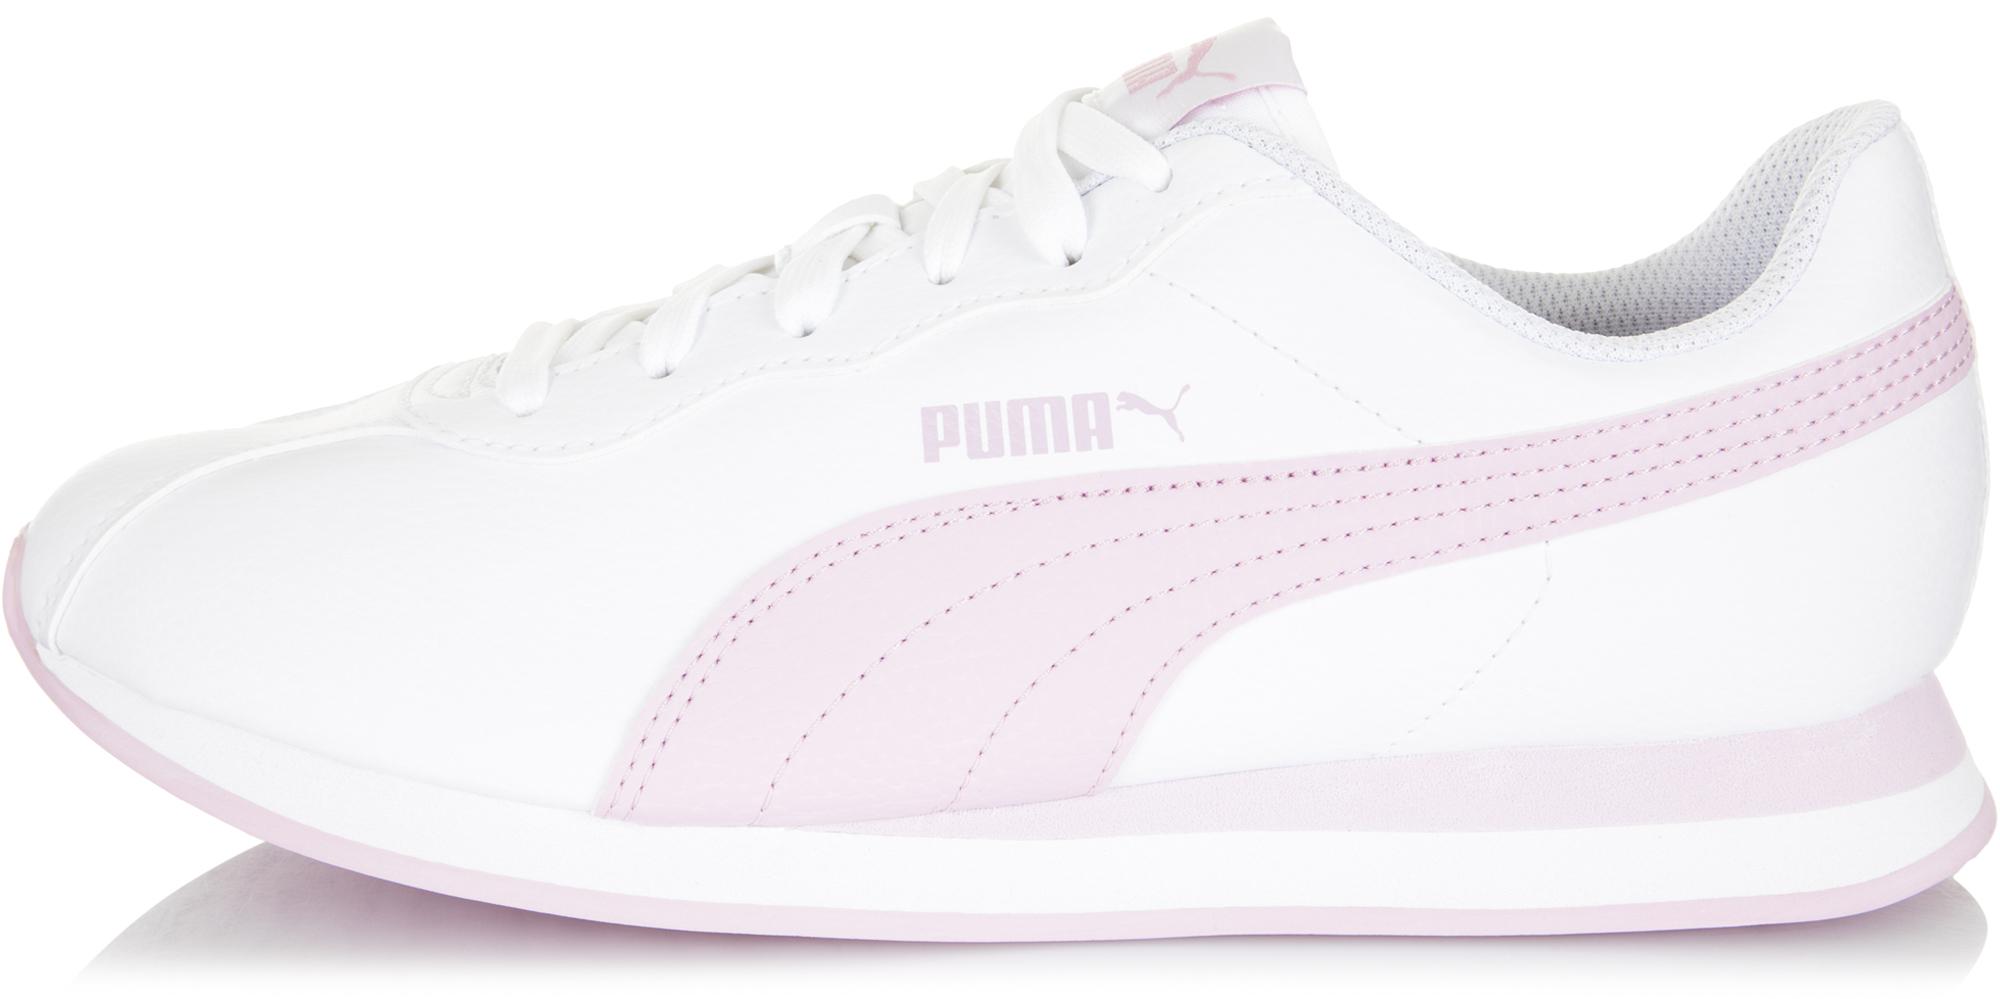 Puma Кроссовки женские Puma Turin II, размер 36,5